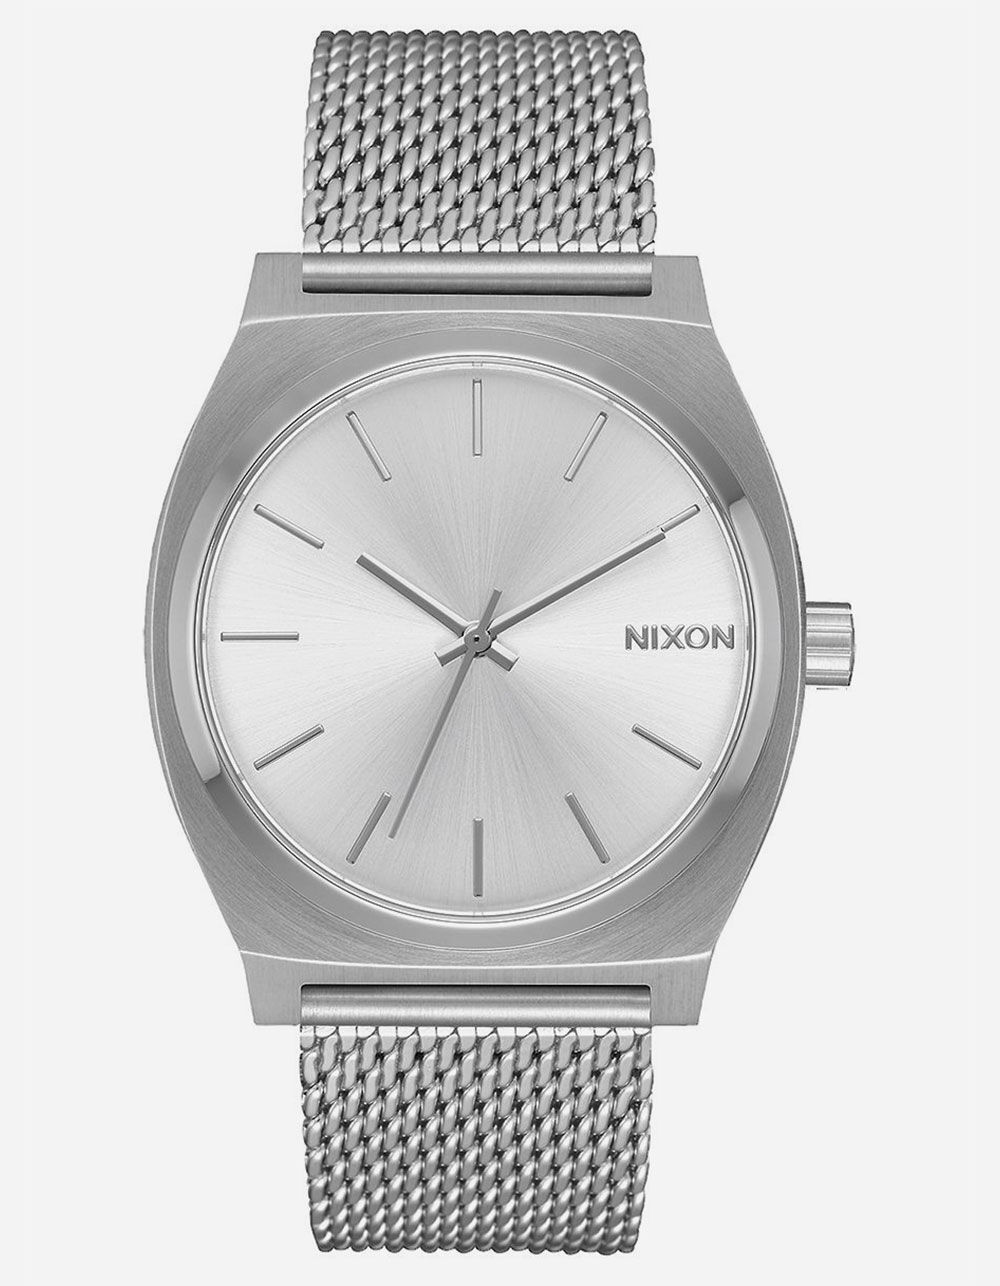 NIXON Time Teller Milanese All Silver Watch